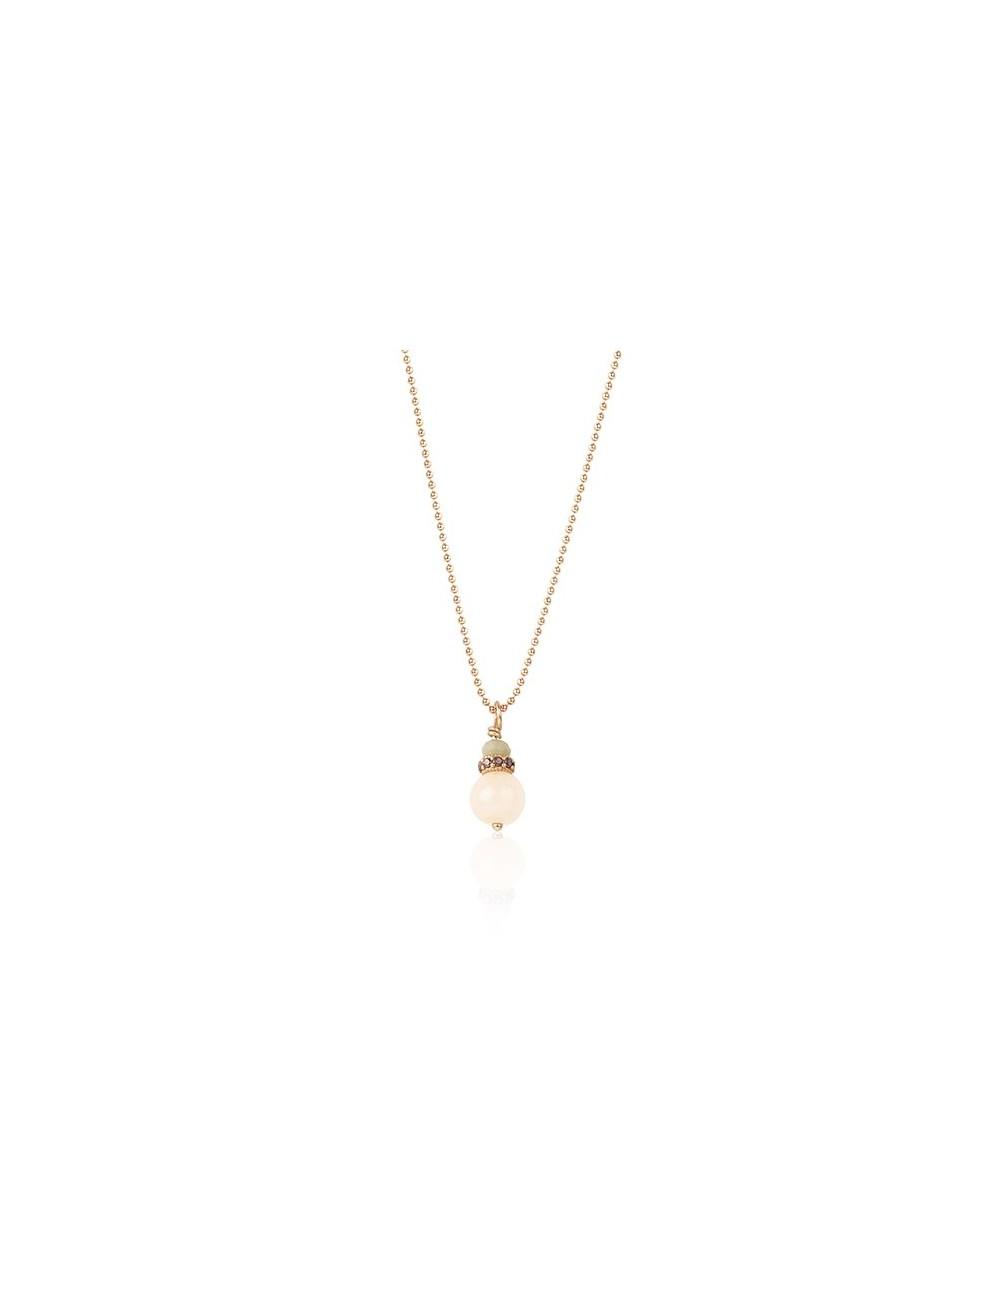 Sunfield -Collar Sunfield plata baño oro rosa, ágata circonitas y cristal -CL062350/15